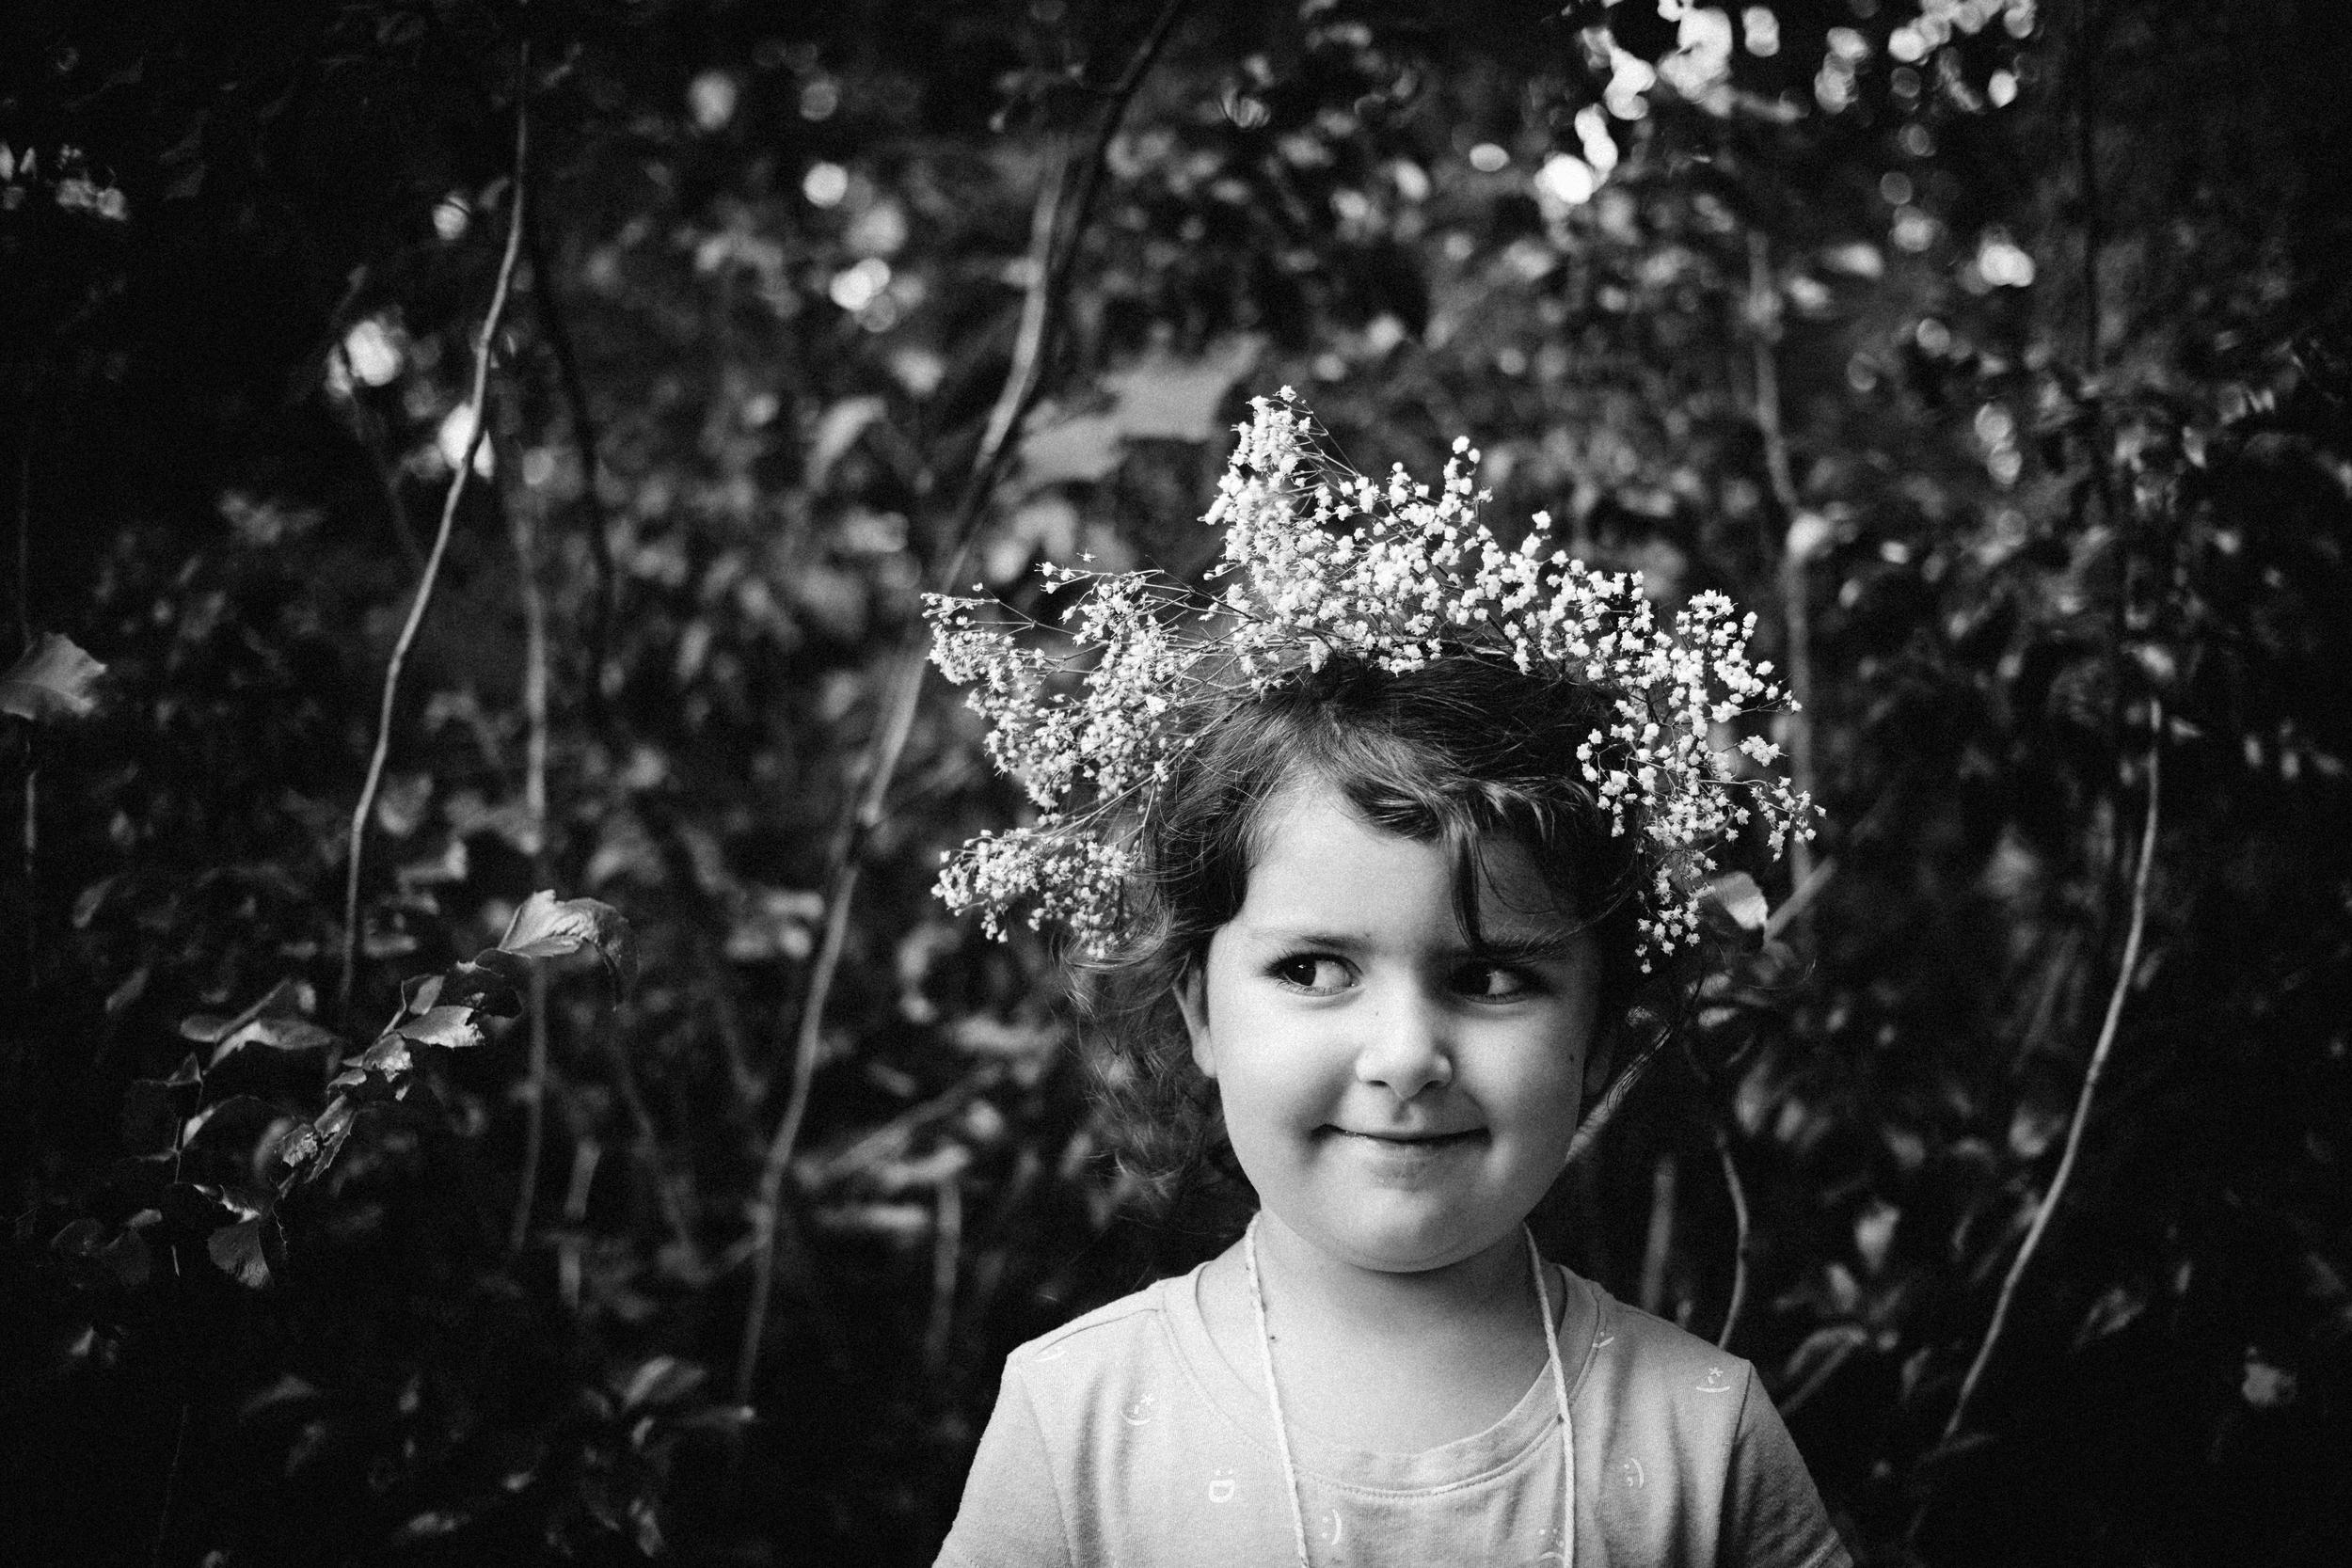 dogwoodphotography_photographer_vancouver_child_roosbday-9.jpg